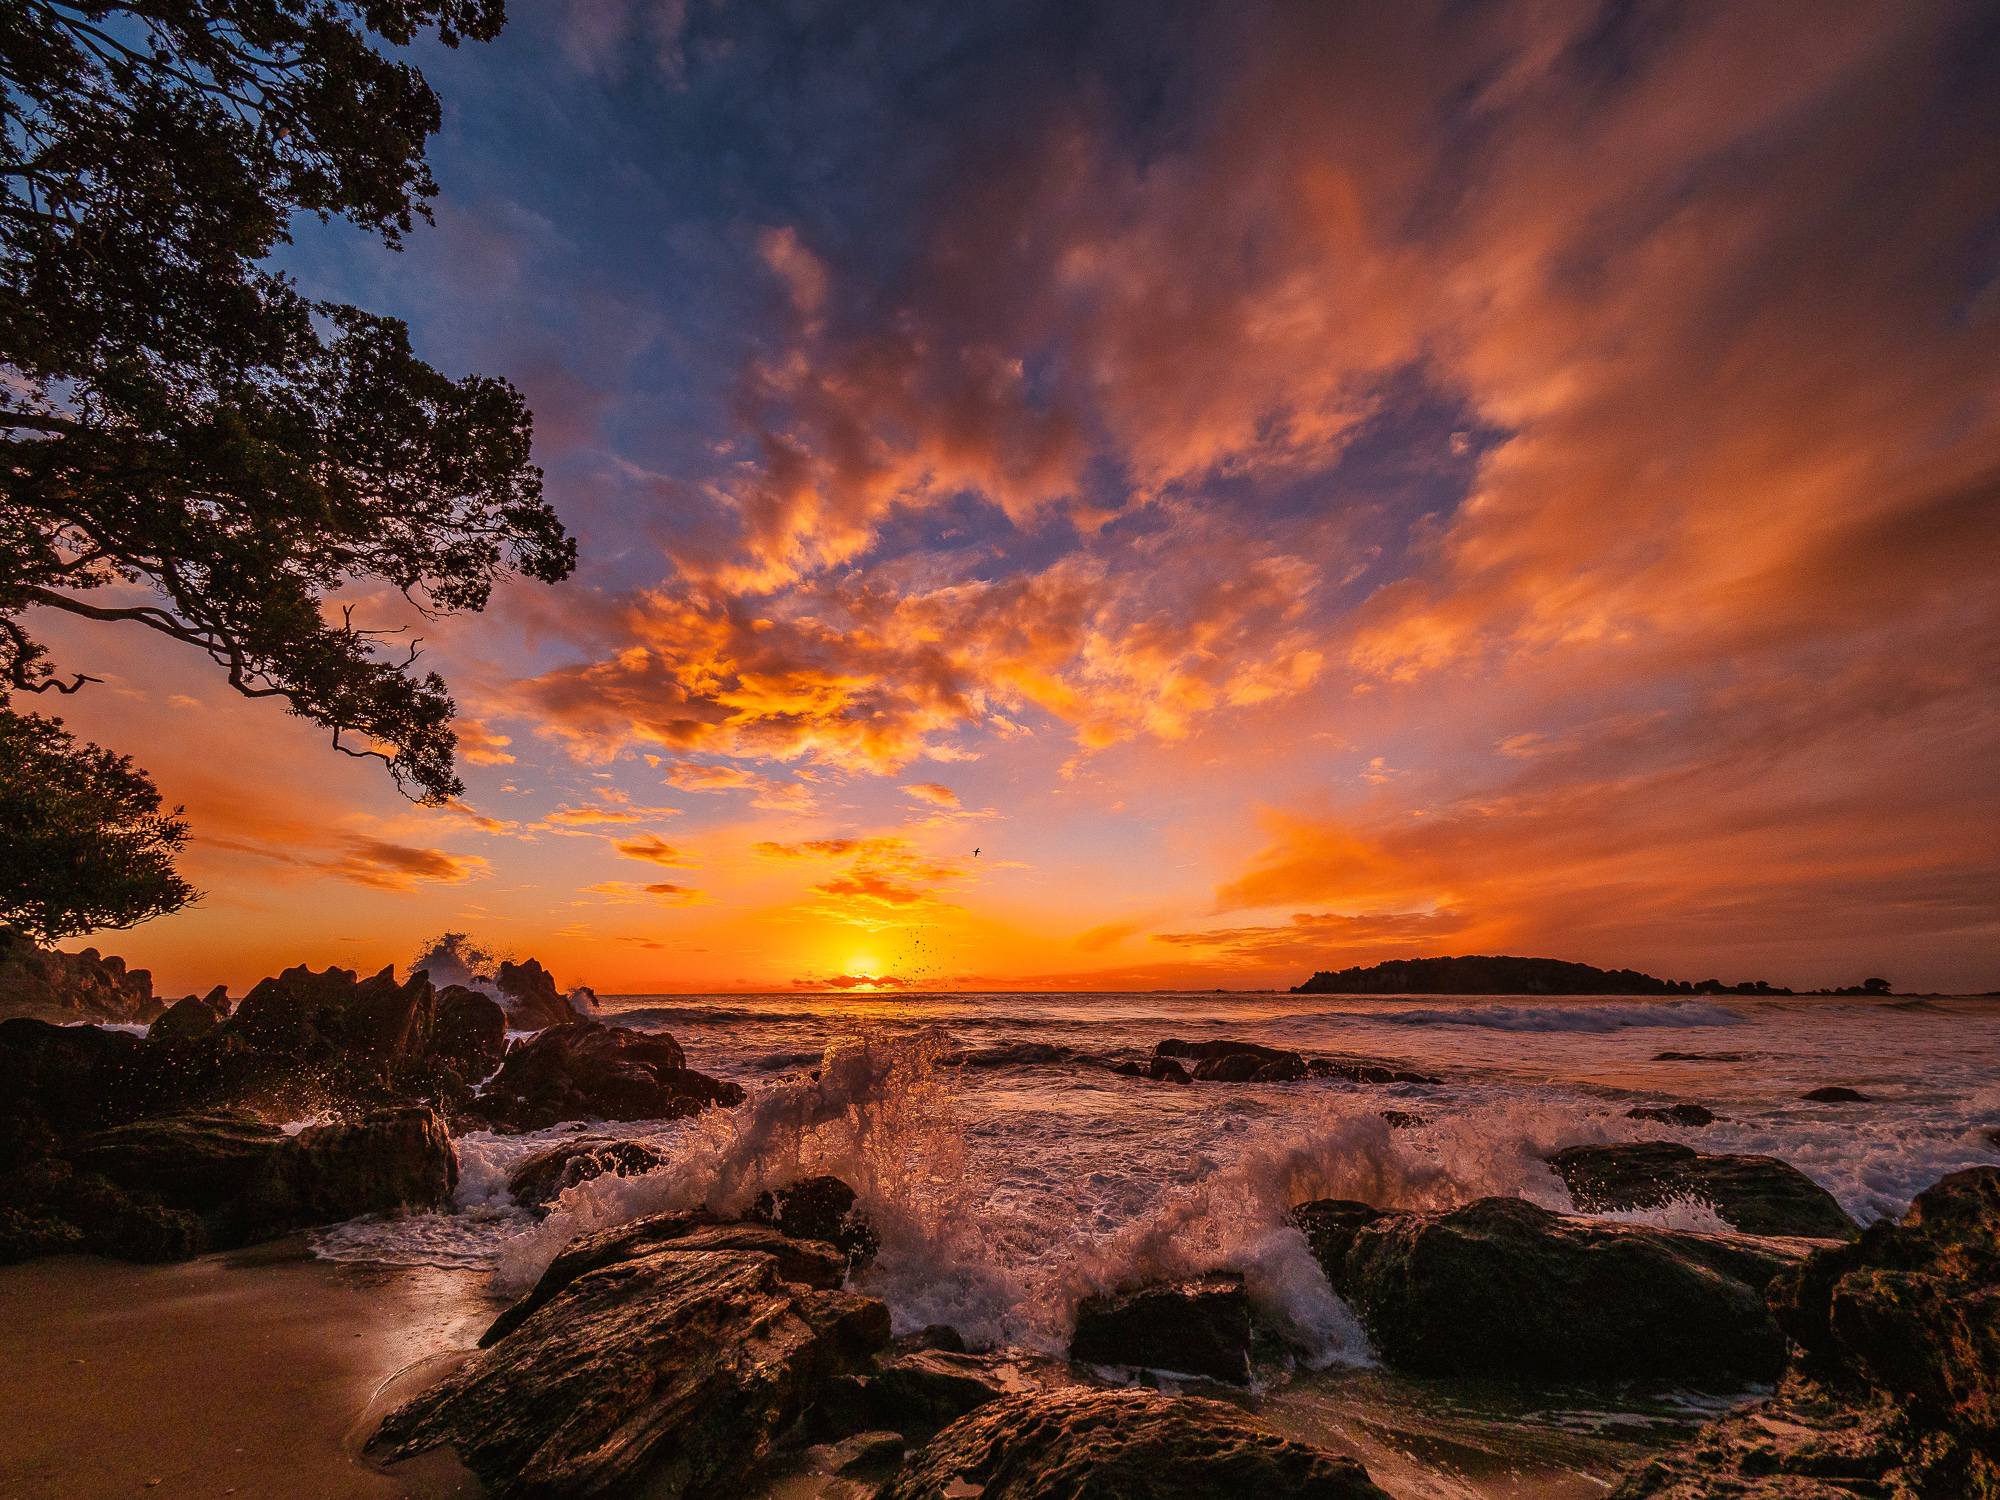 High tide at dawn. Mount Maunganui Beach. P7200107